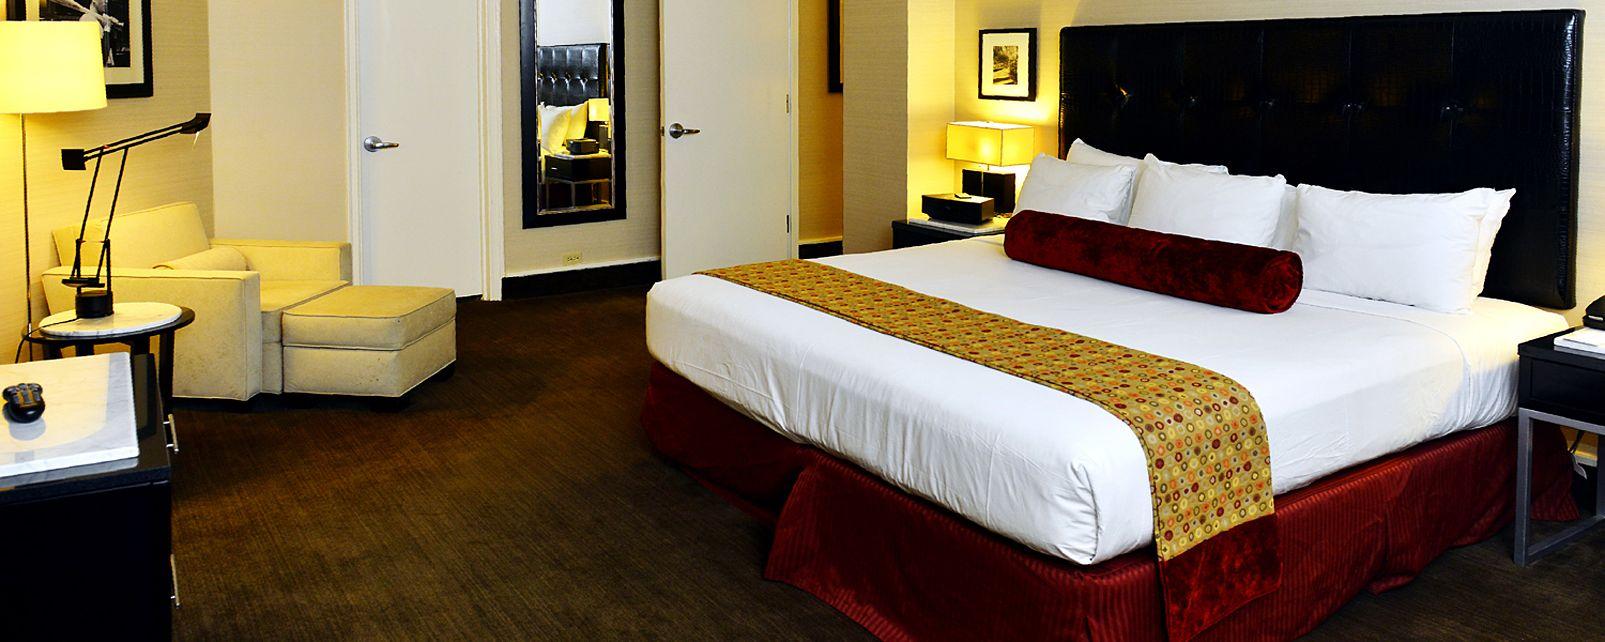 Hôtel Radisson Lexington Hotel New York